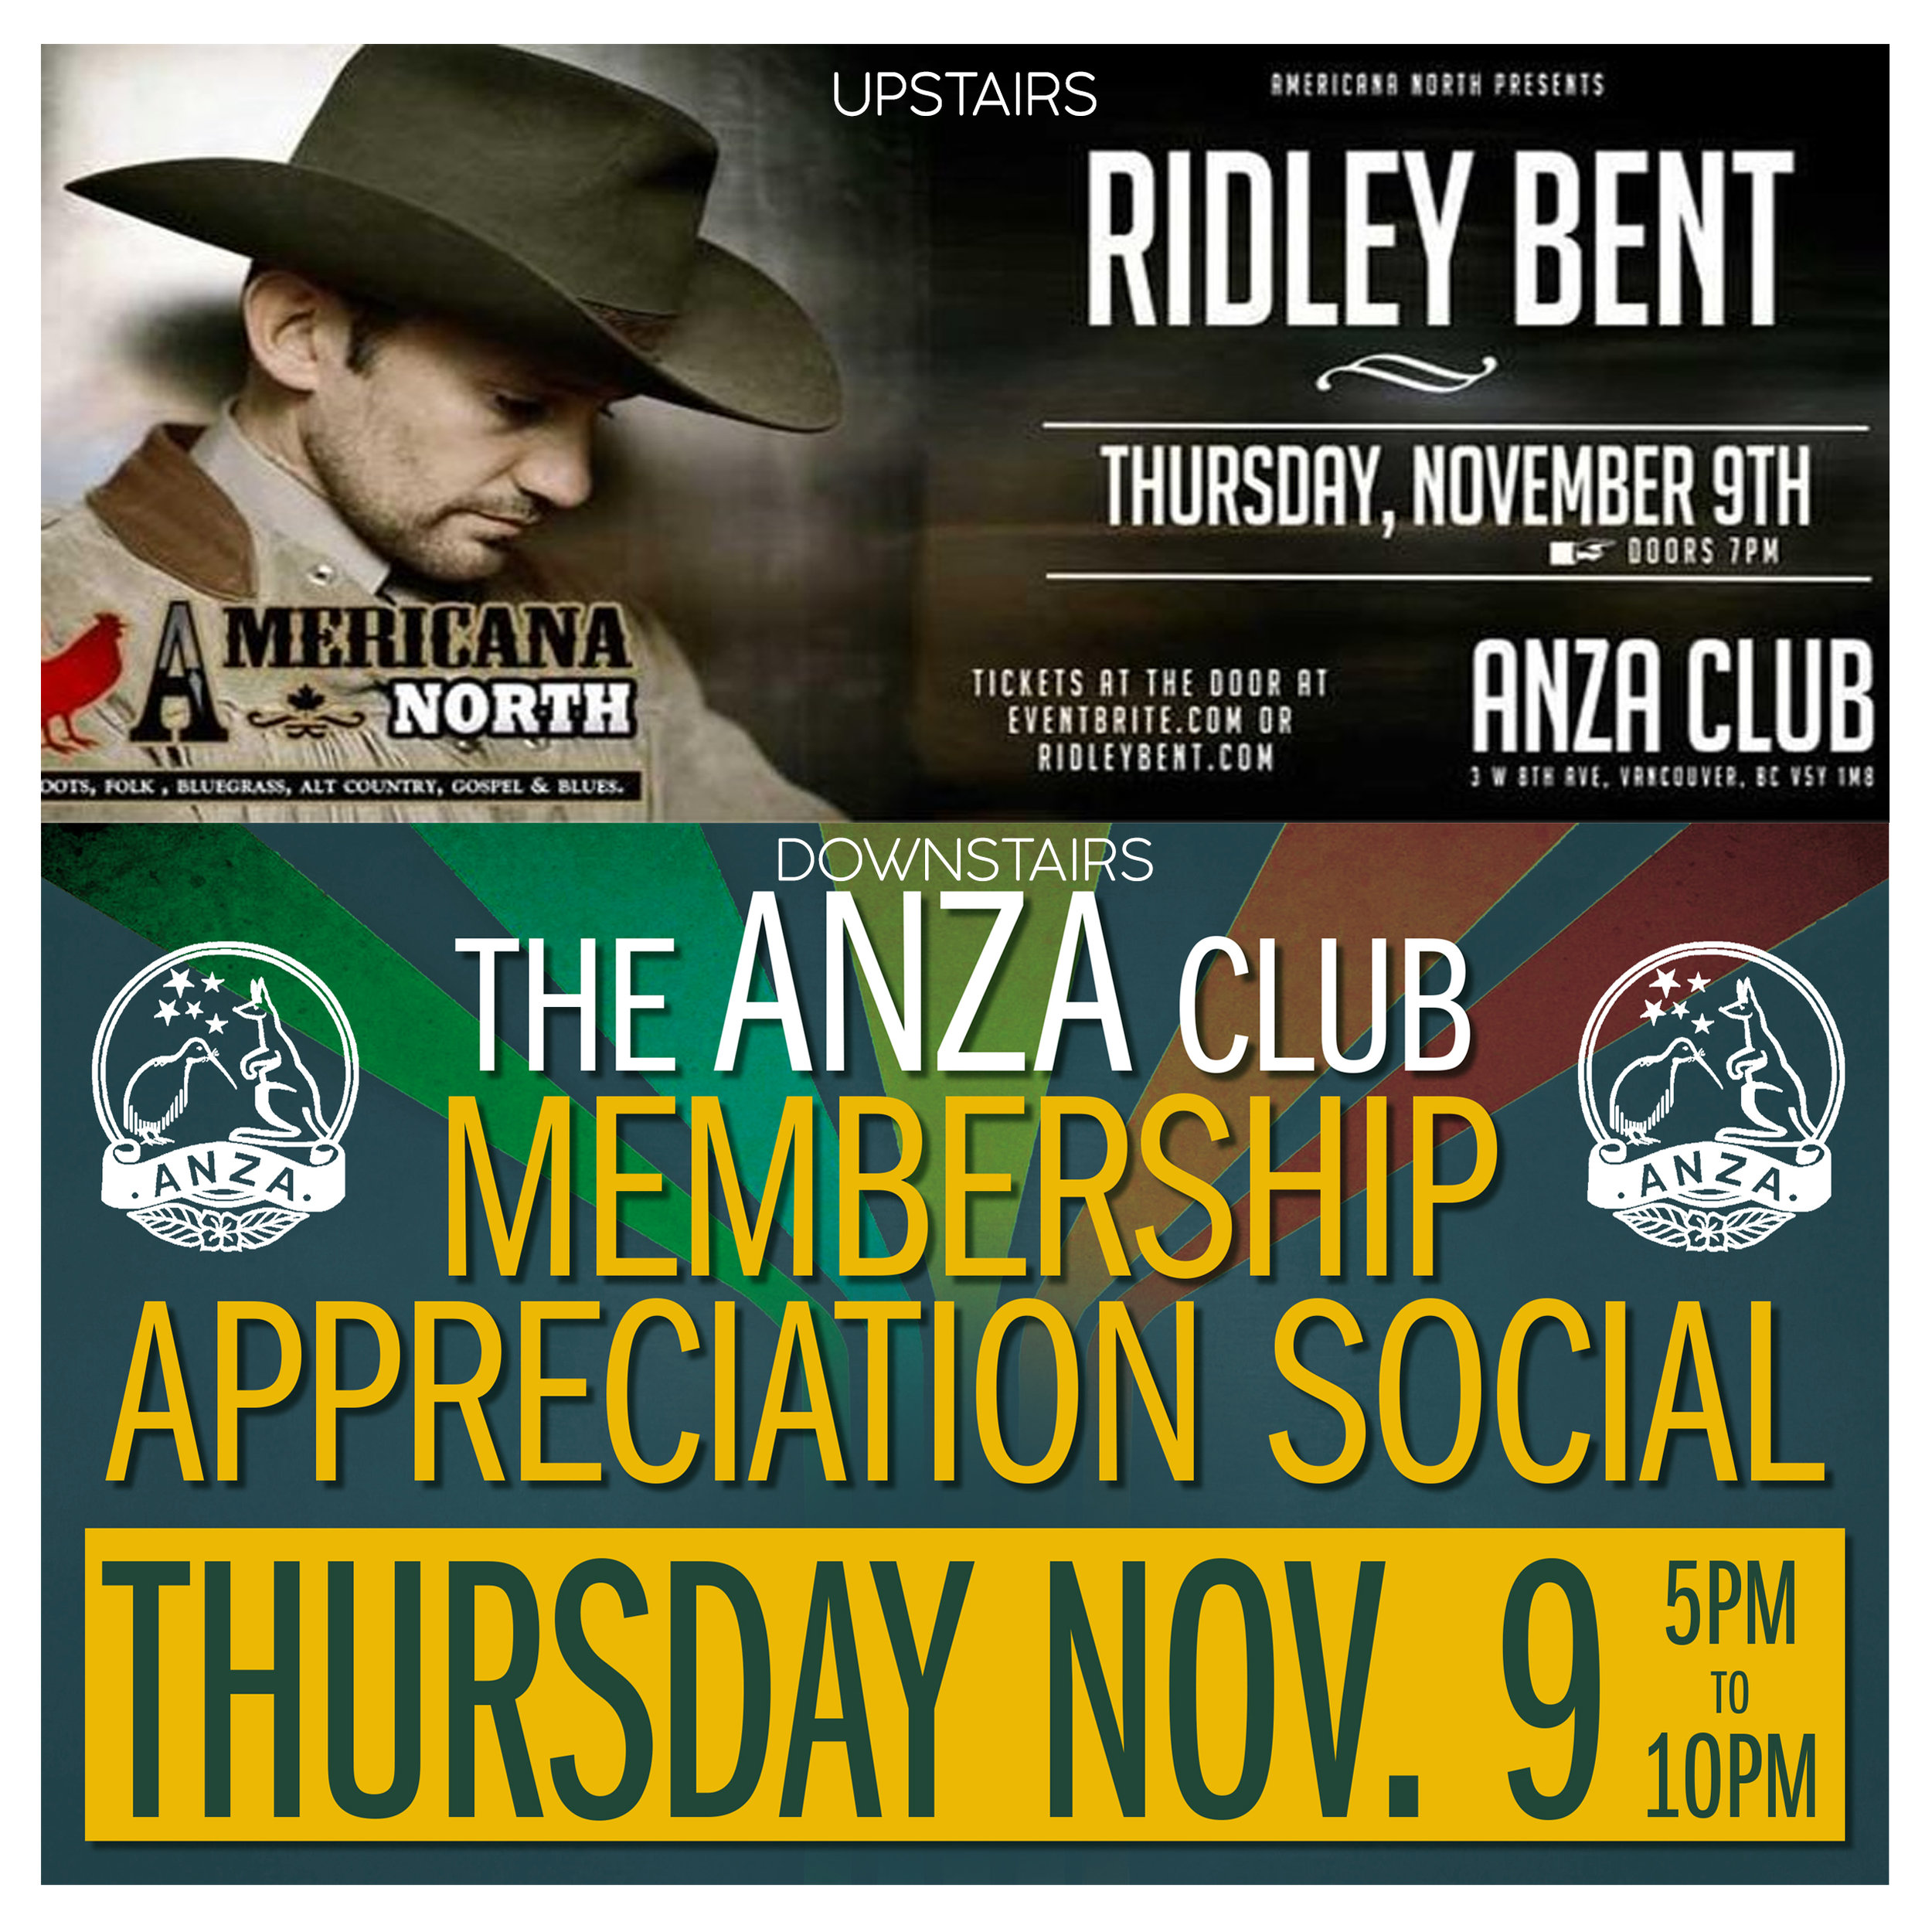 ANZA Members Social Nov9 v5 hiRESridley.jpg